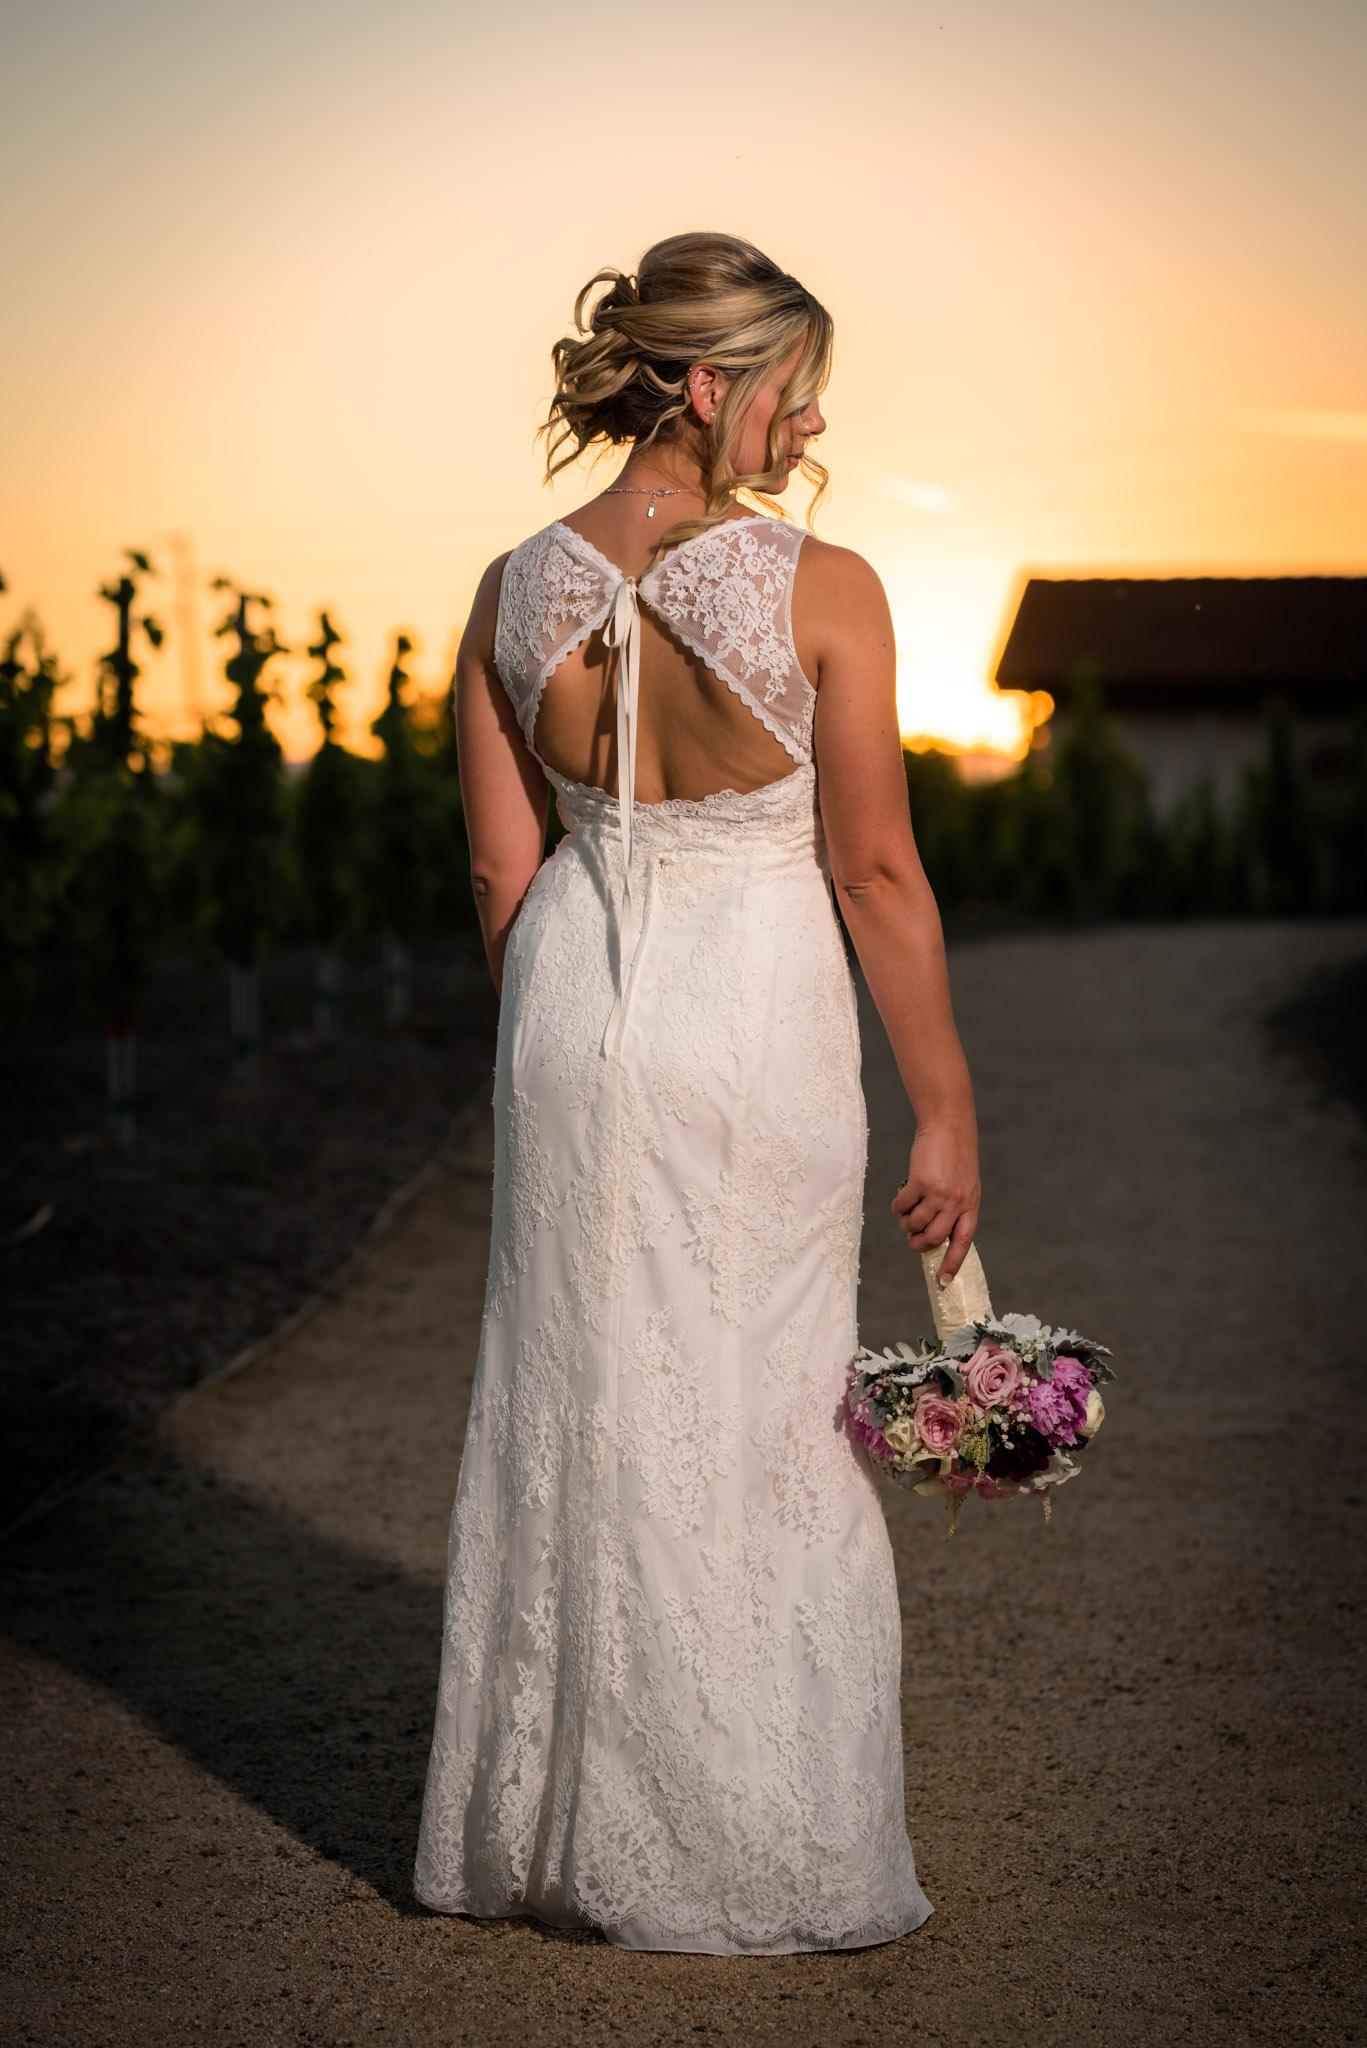 Avensole-Winery-Temecula-Wedding-Josh-and-Olivia-3820.JPG